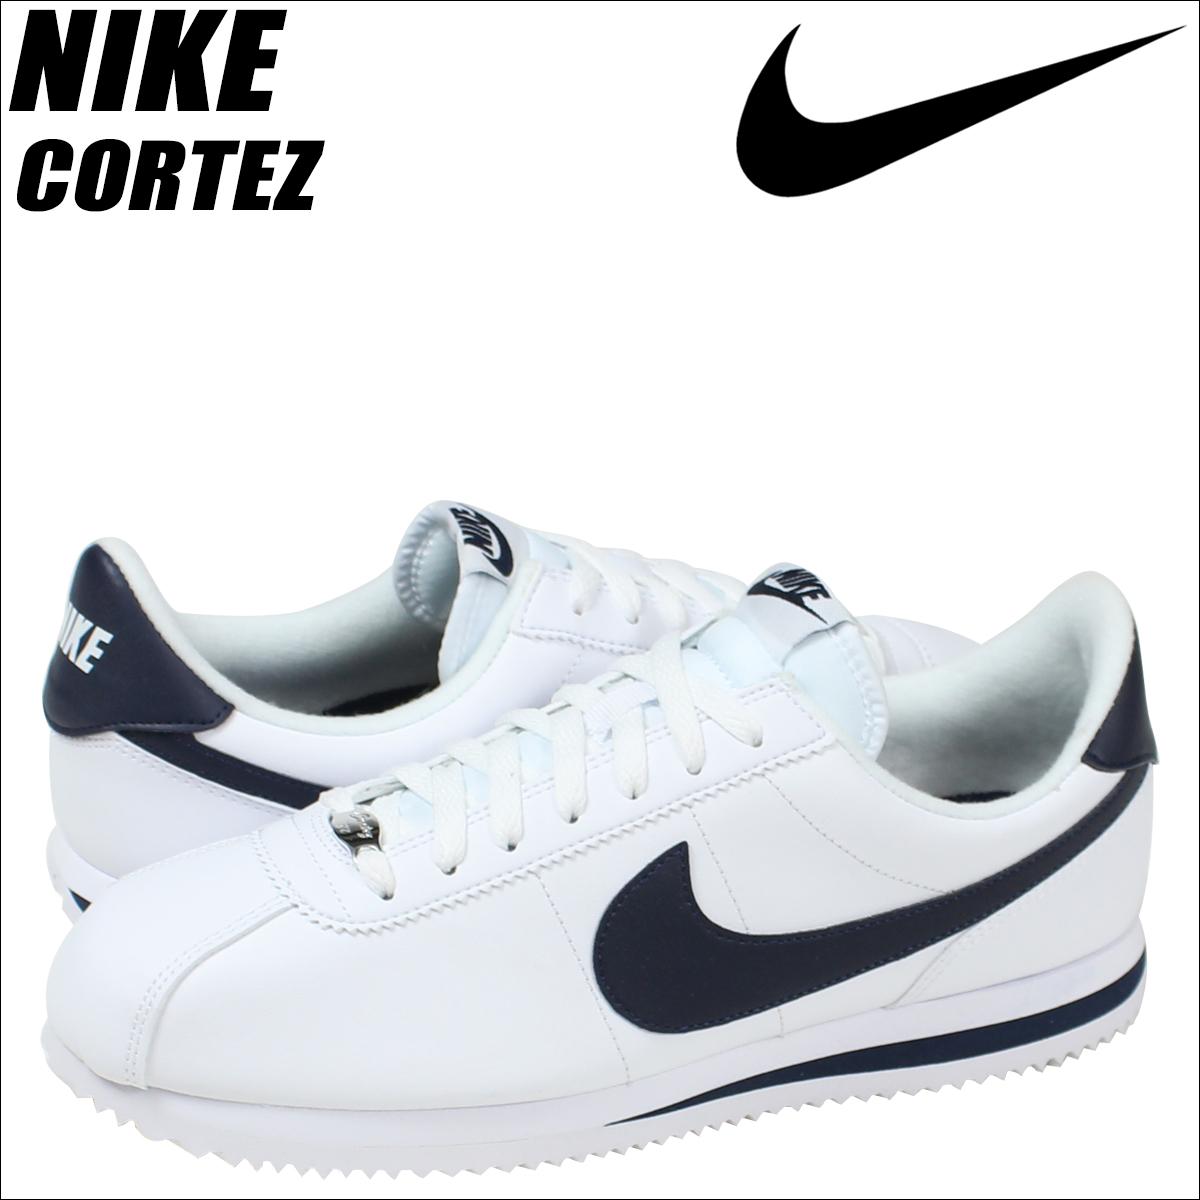 Nike OG Cortez Basic Leather Men's